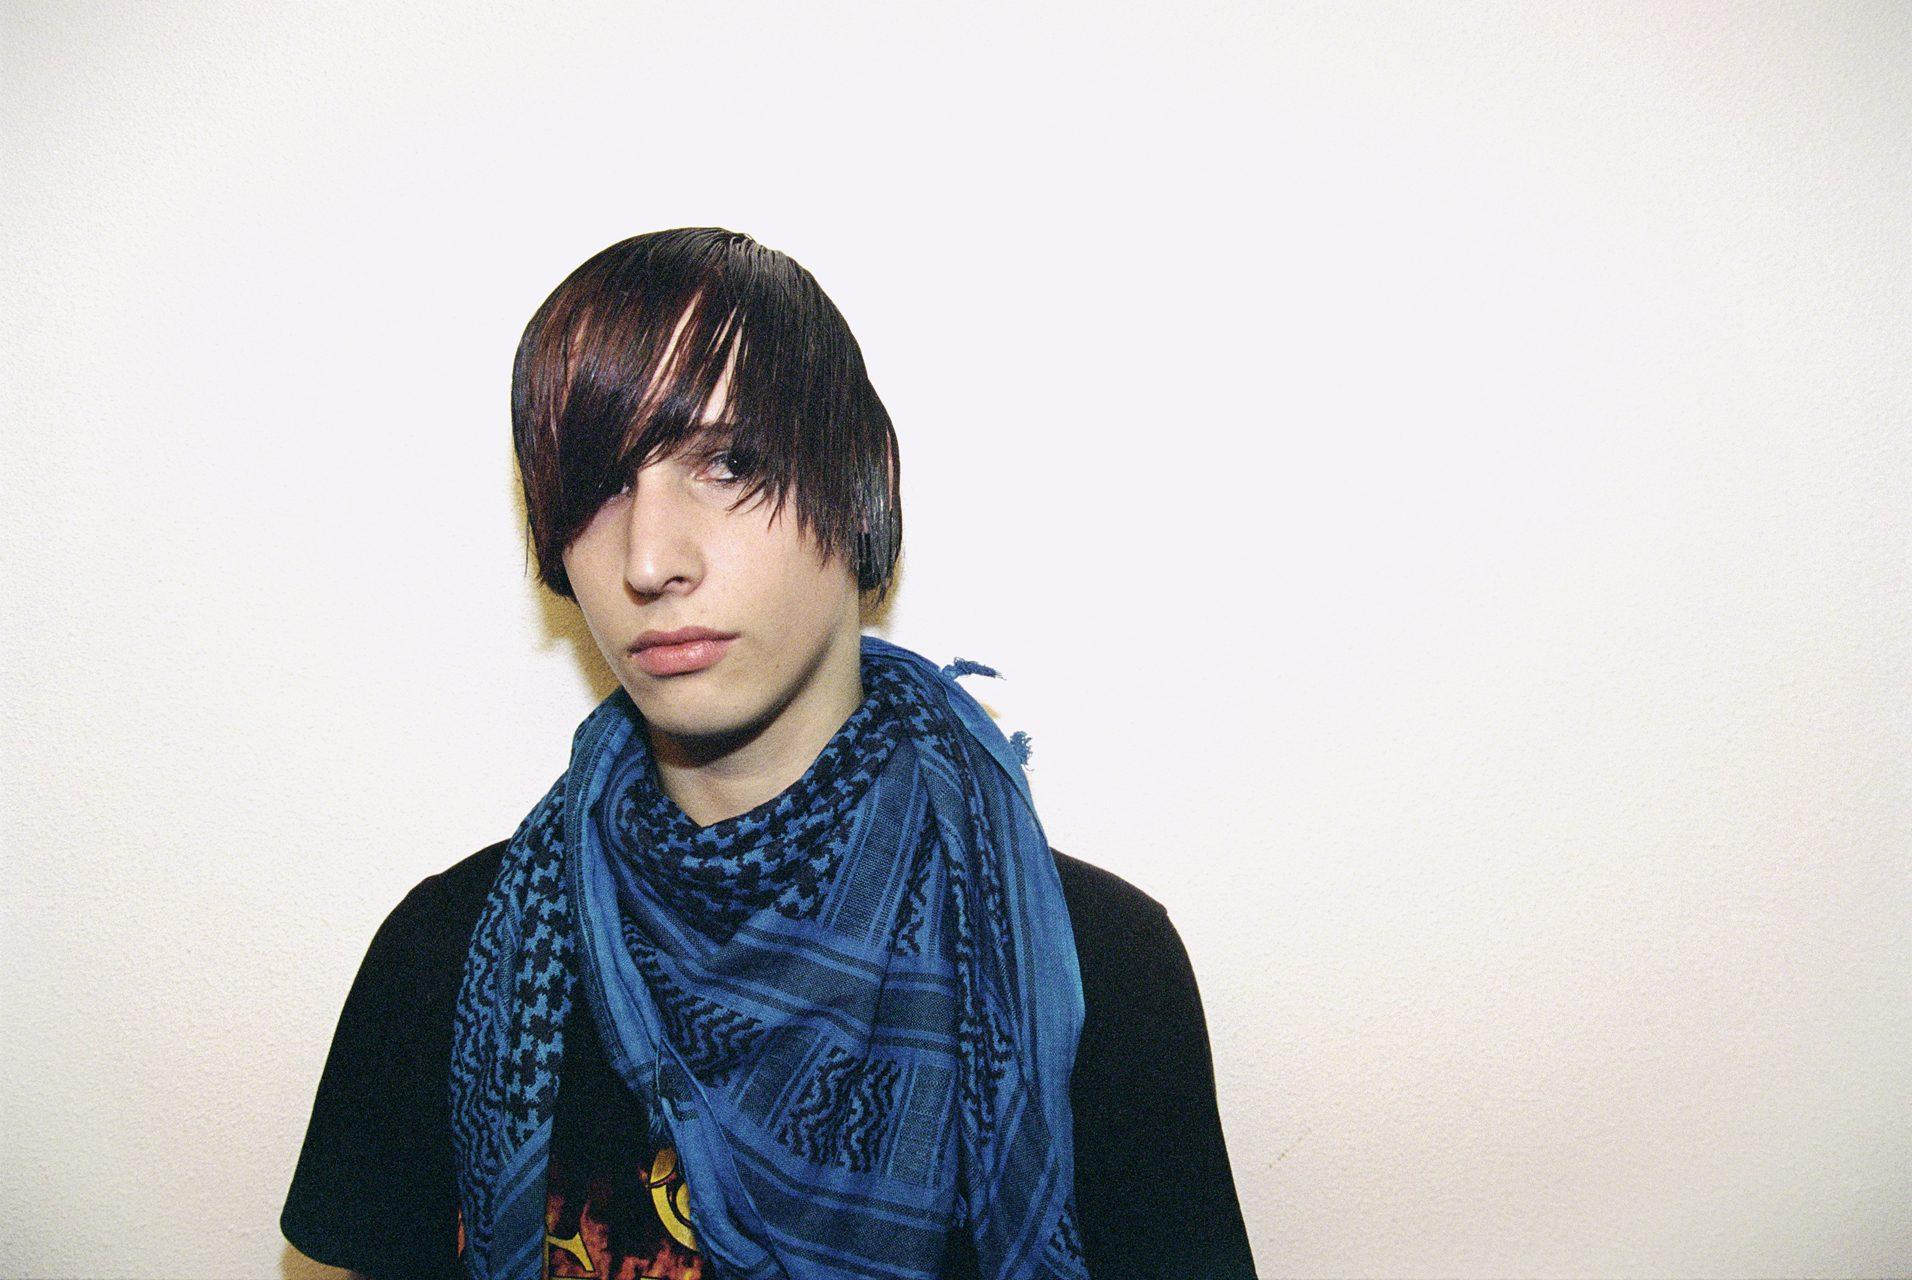 Yoshri, 15 years old.